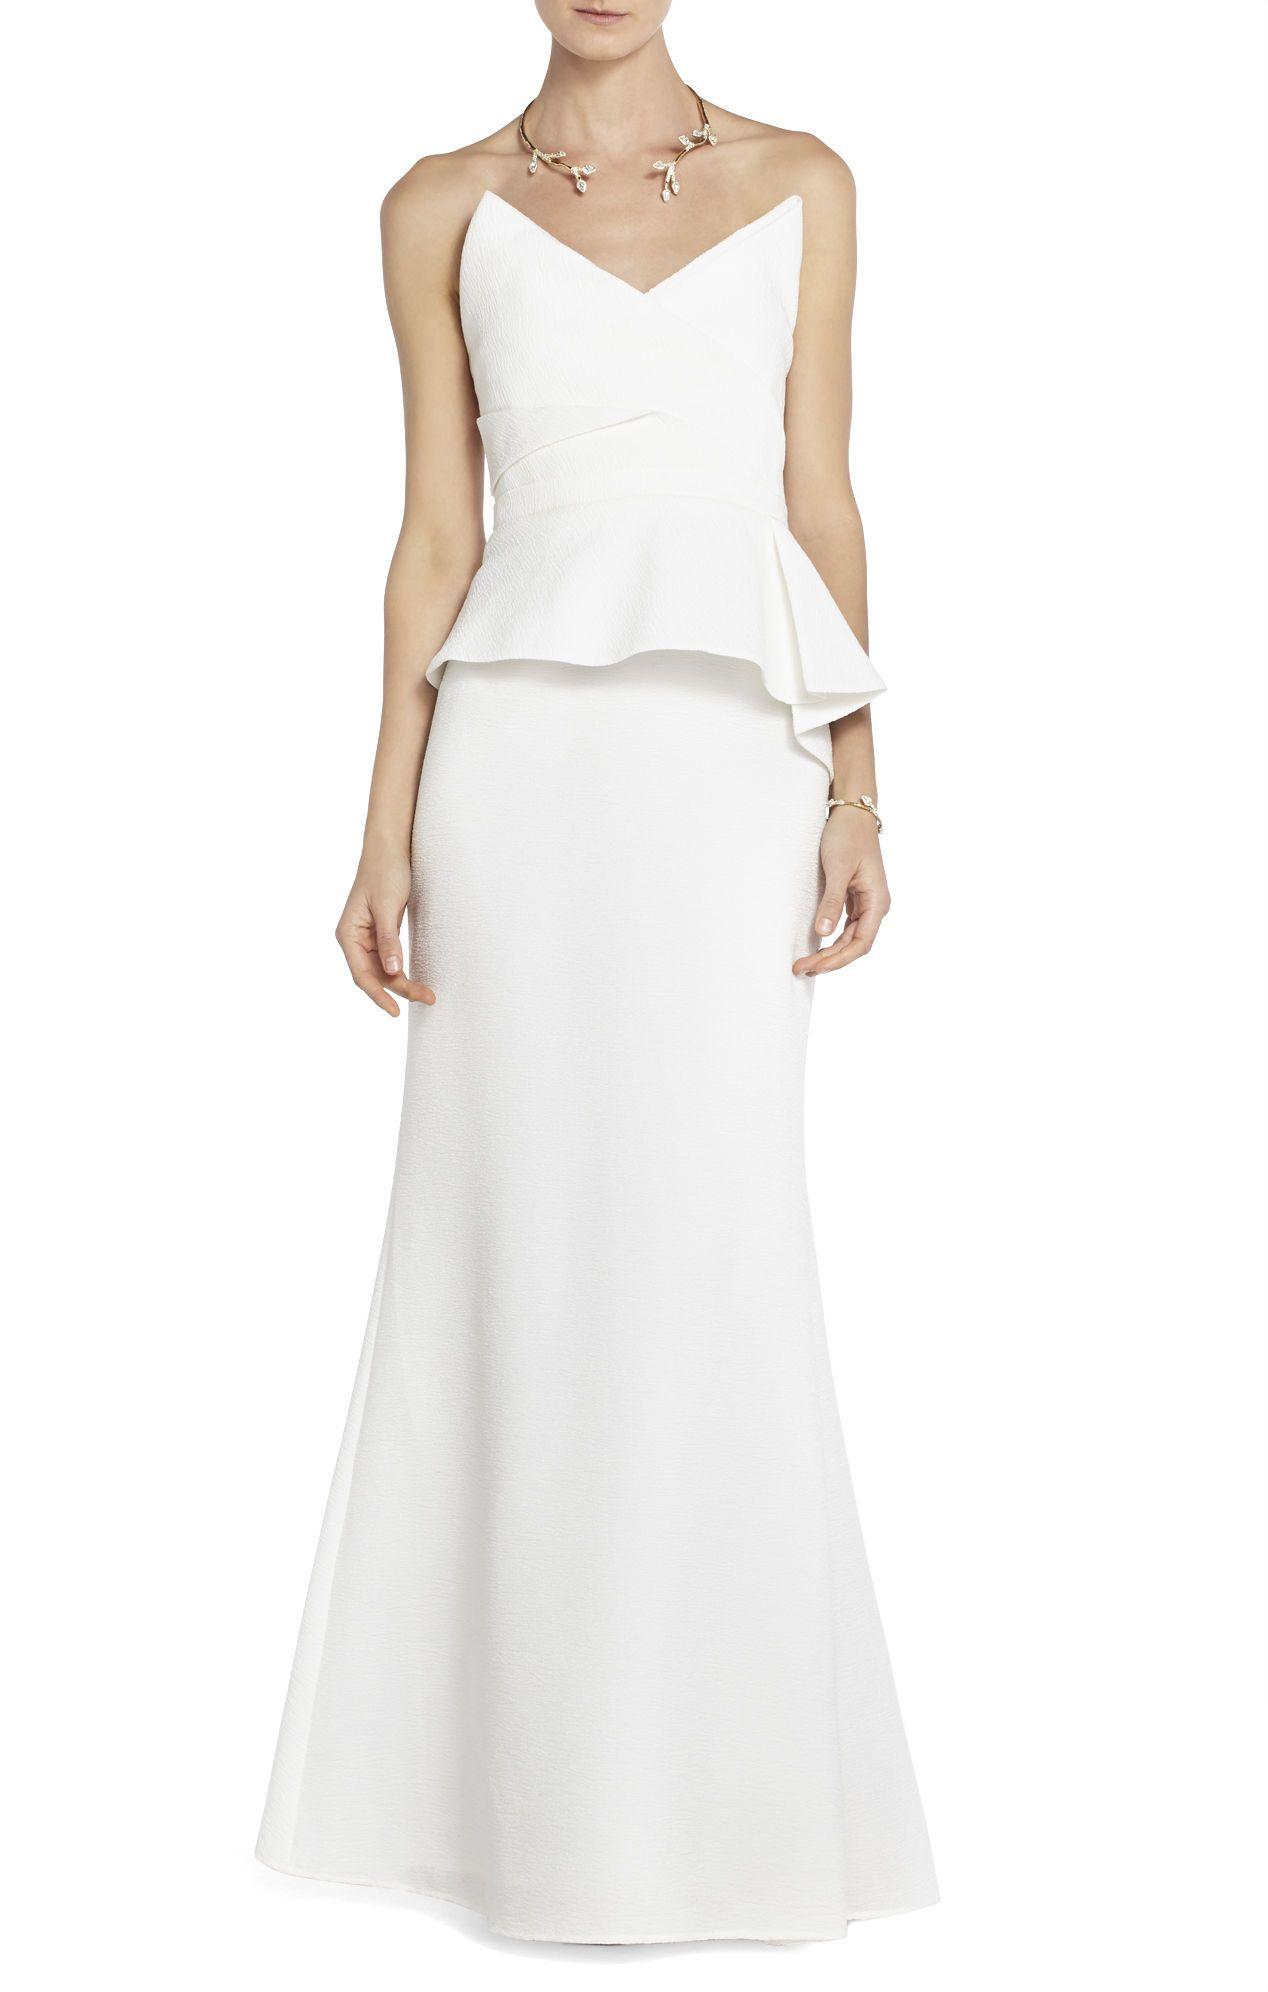 BCBGMAXAZRIA Gracie Strapless Peplum Gown   BCBG.com   Dress ...